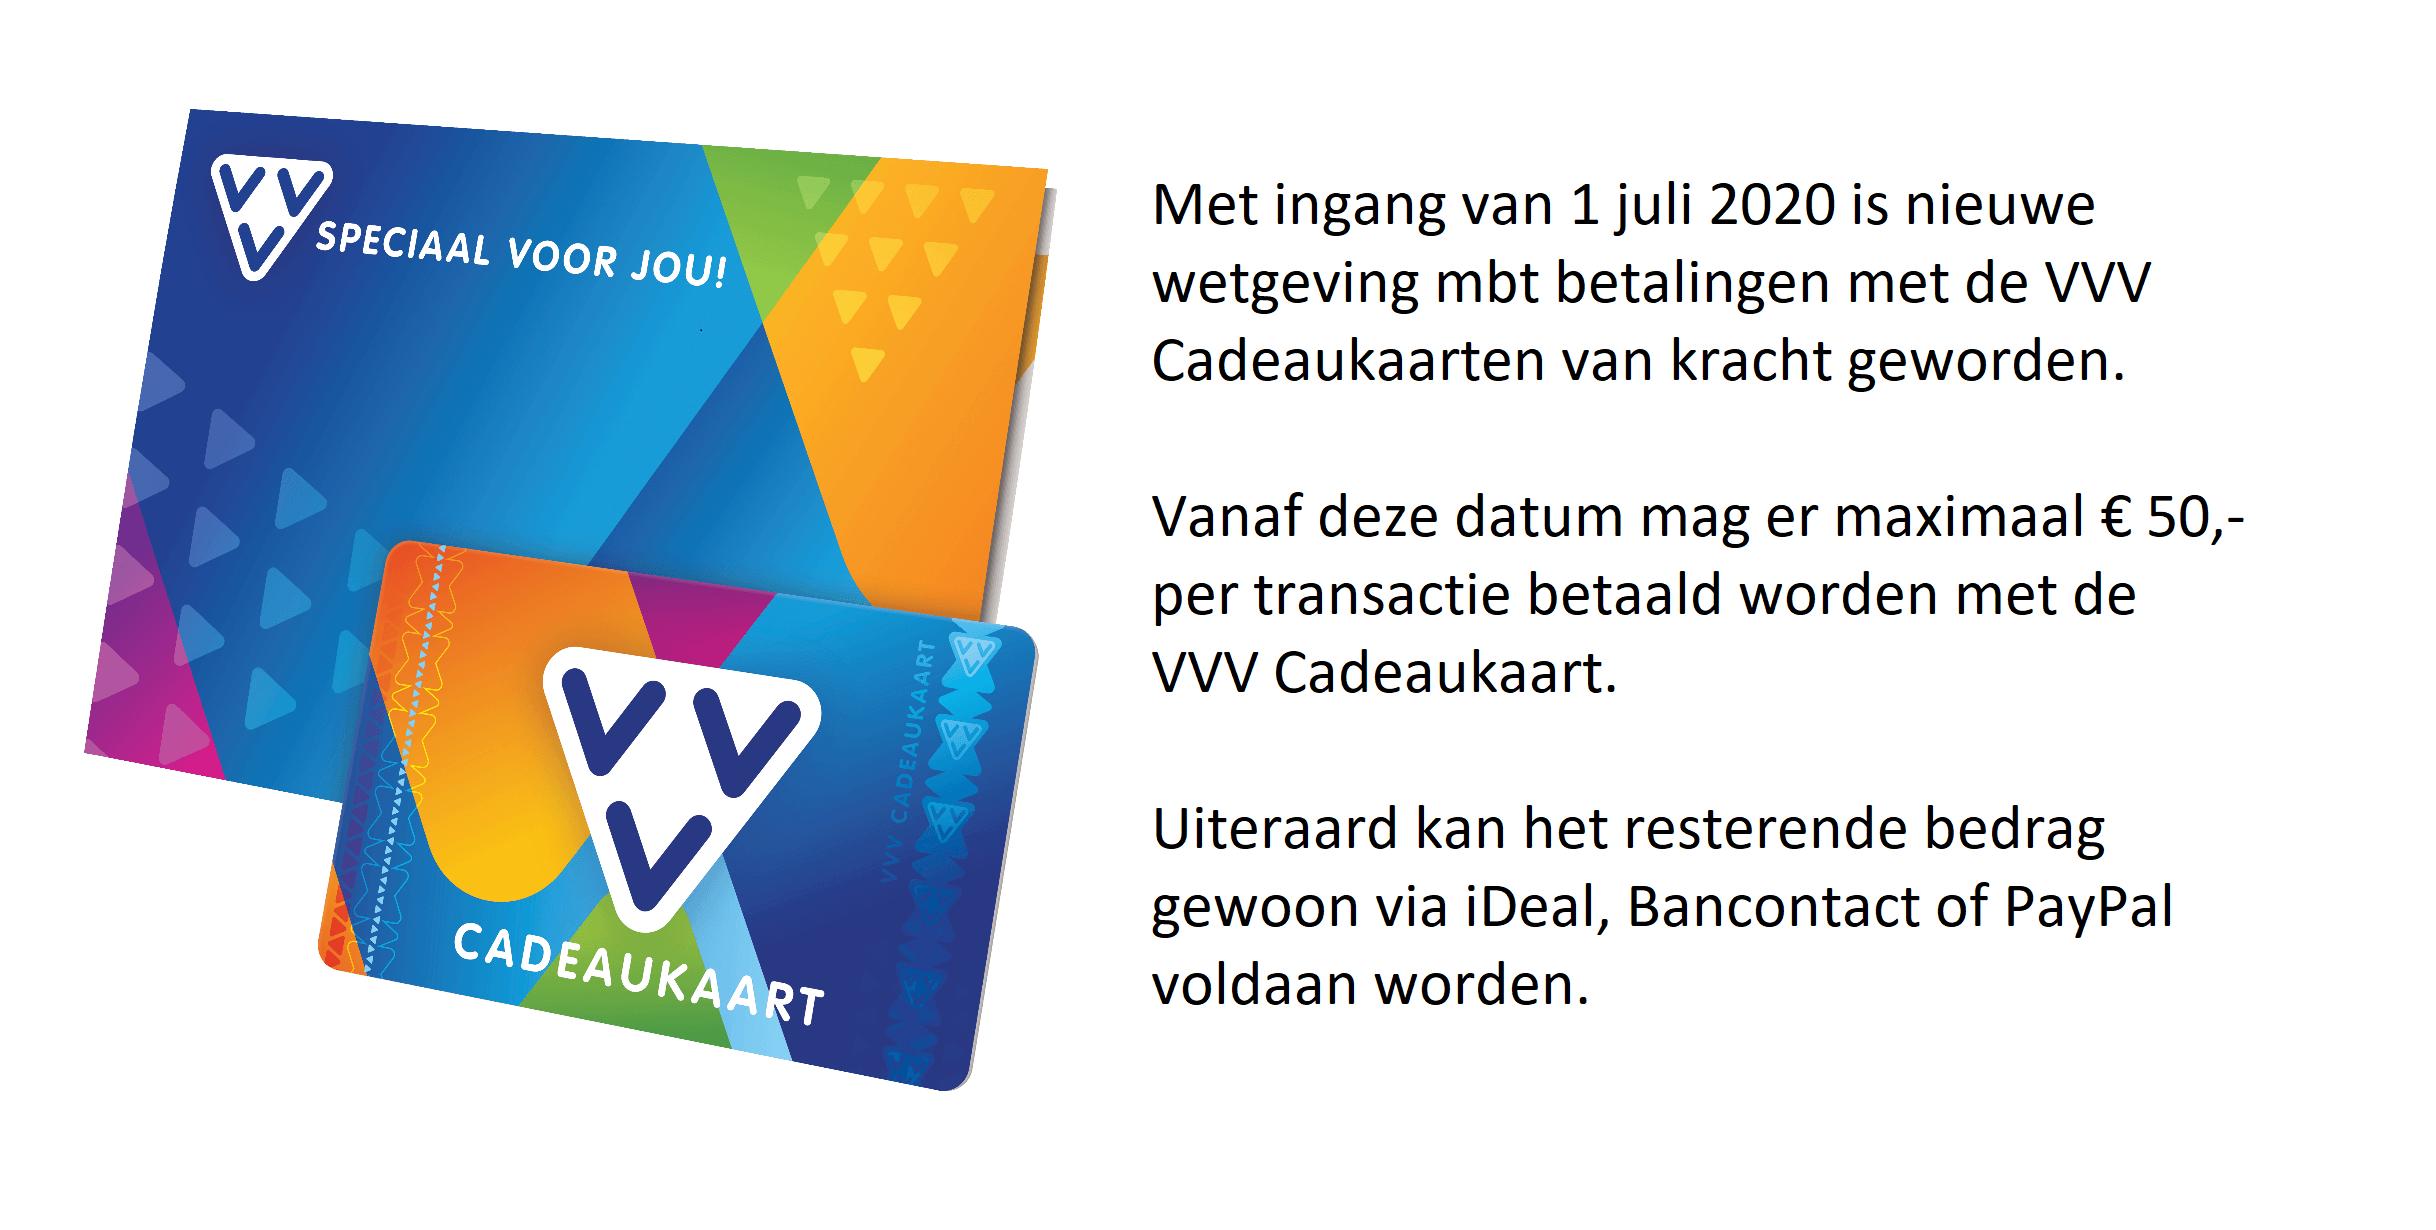 Maximuxm transactiebedrag € 50,-